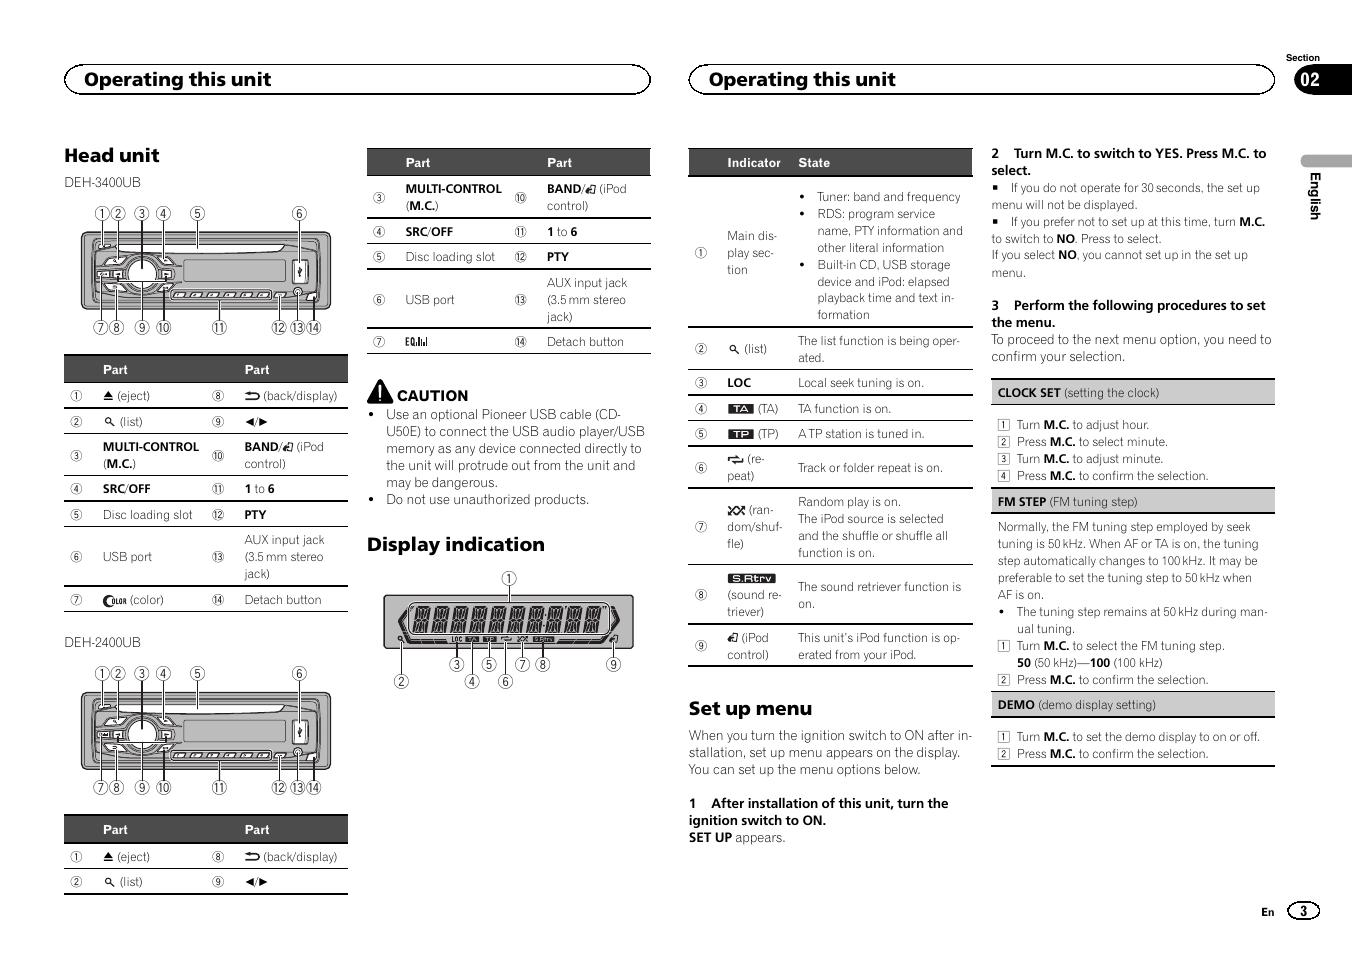 head unit display indication set up menu pioneer deh 3400ub user rh manualsdir com Pioneer Mosfet 50Wx4 Car Stereo Manuals pioneer deh 3200ub user's manual